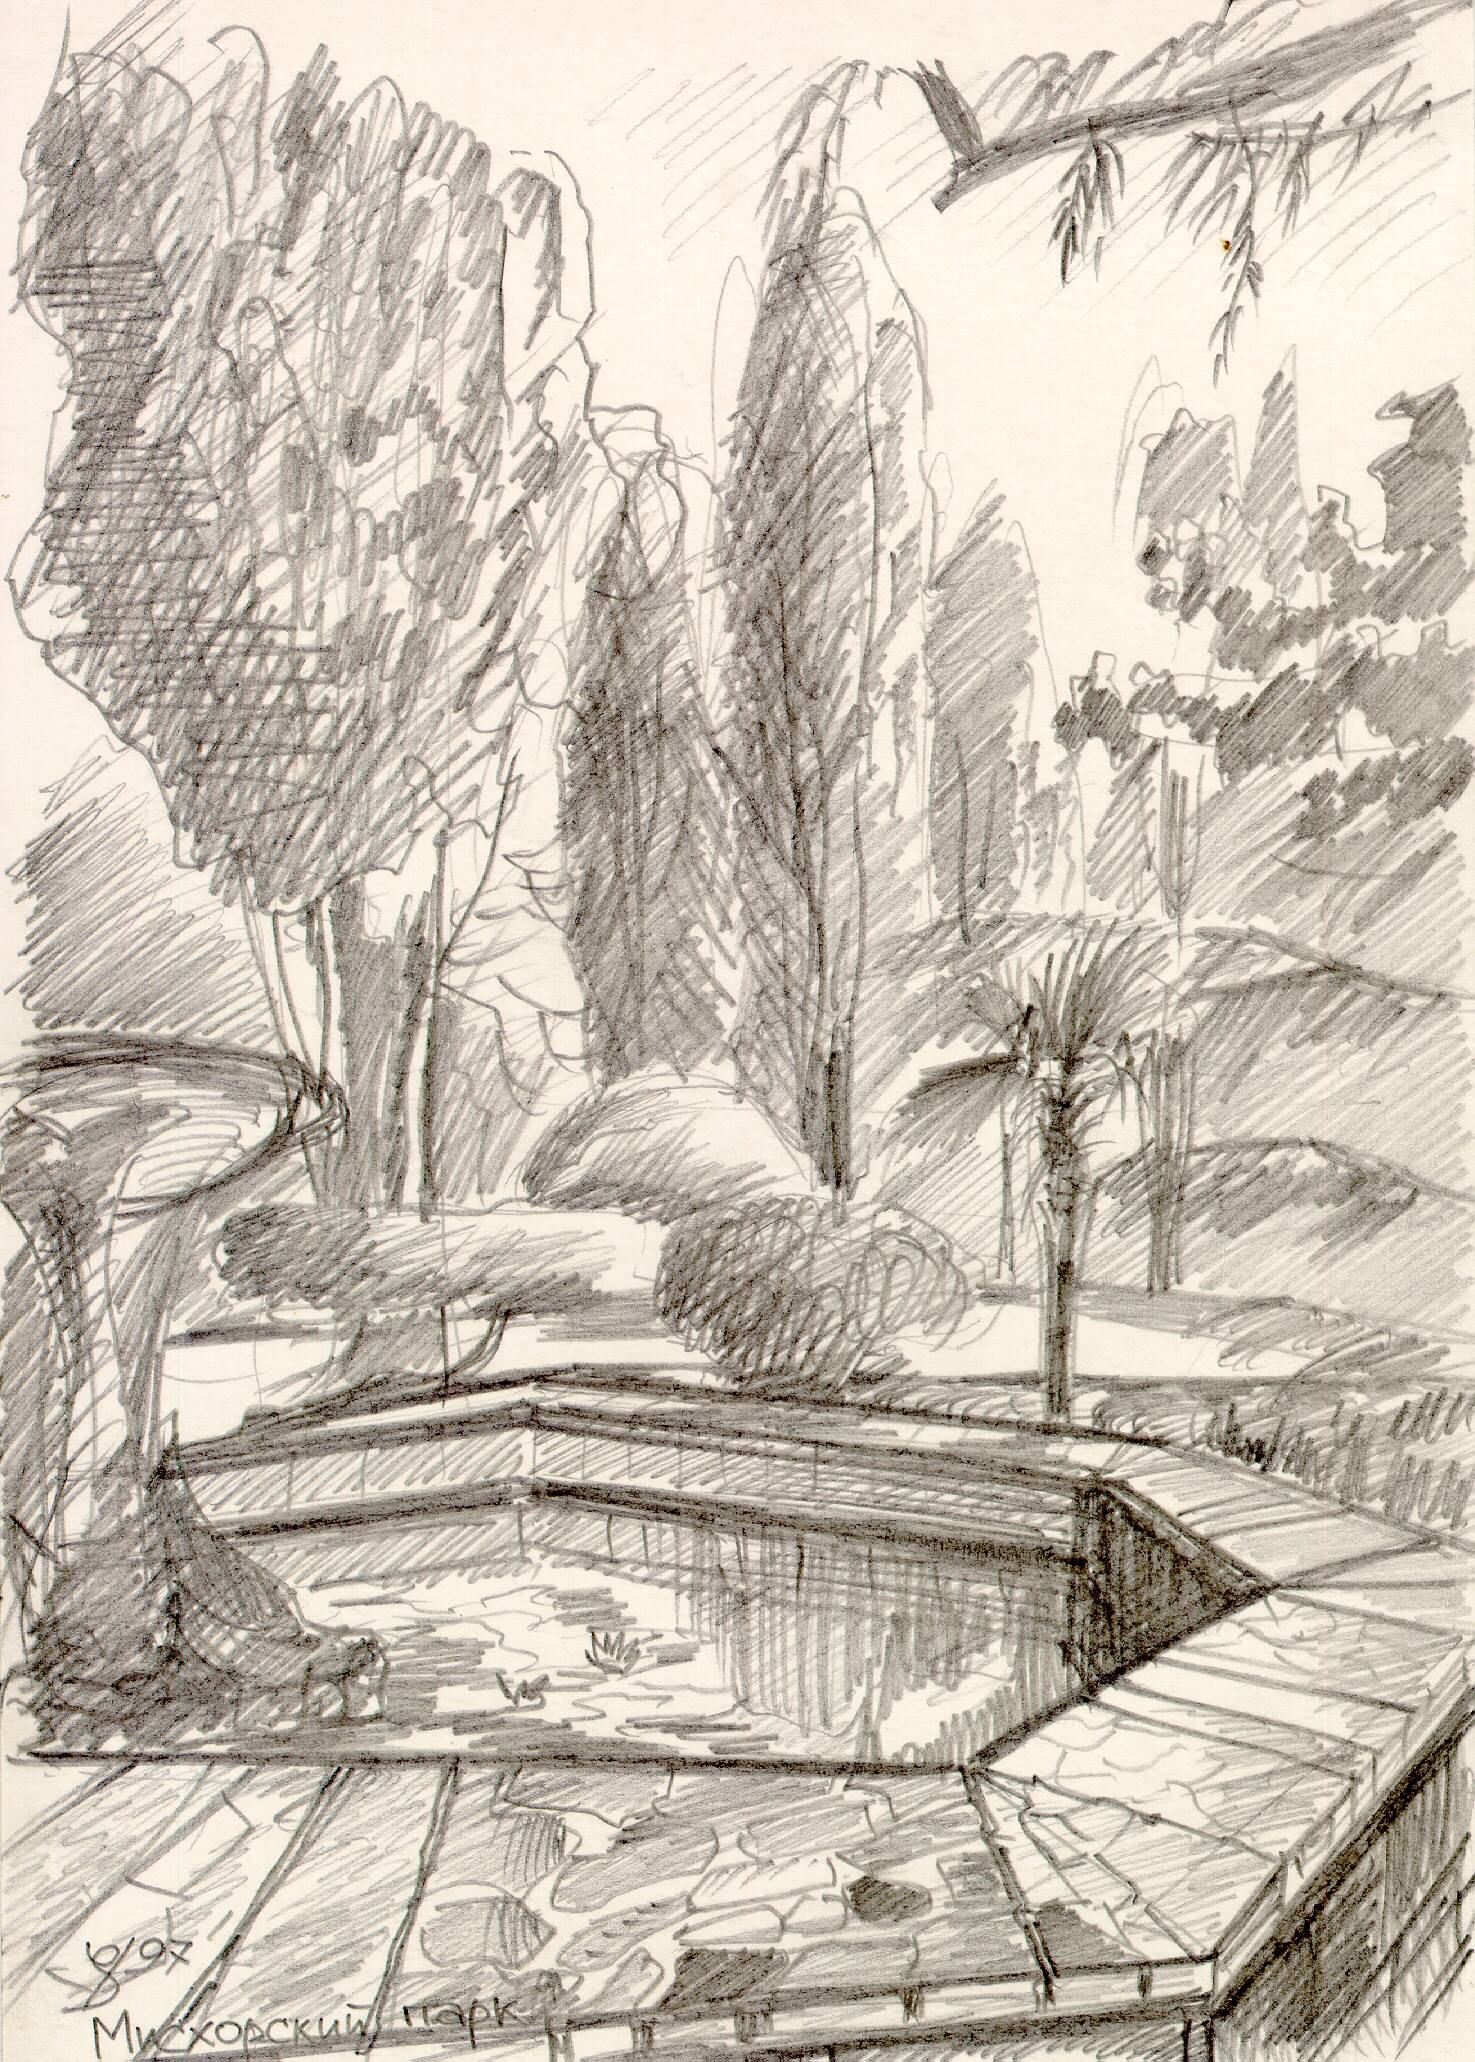 Фонтан в Мисхорском парке, рисунок ...: www.borodulin.su/grafika/risunki-karandashom